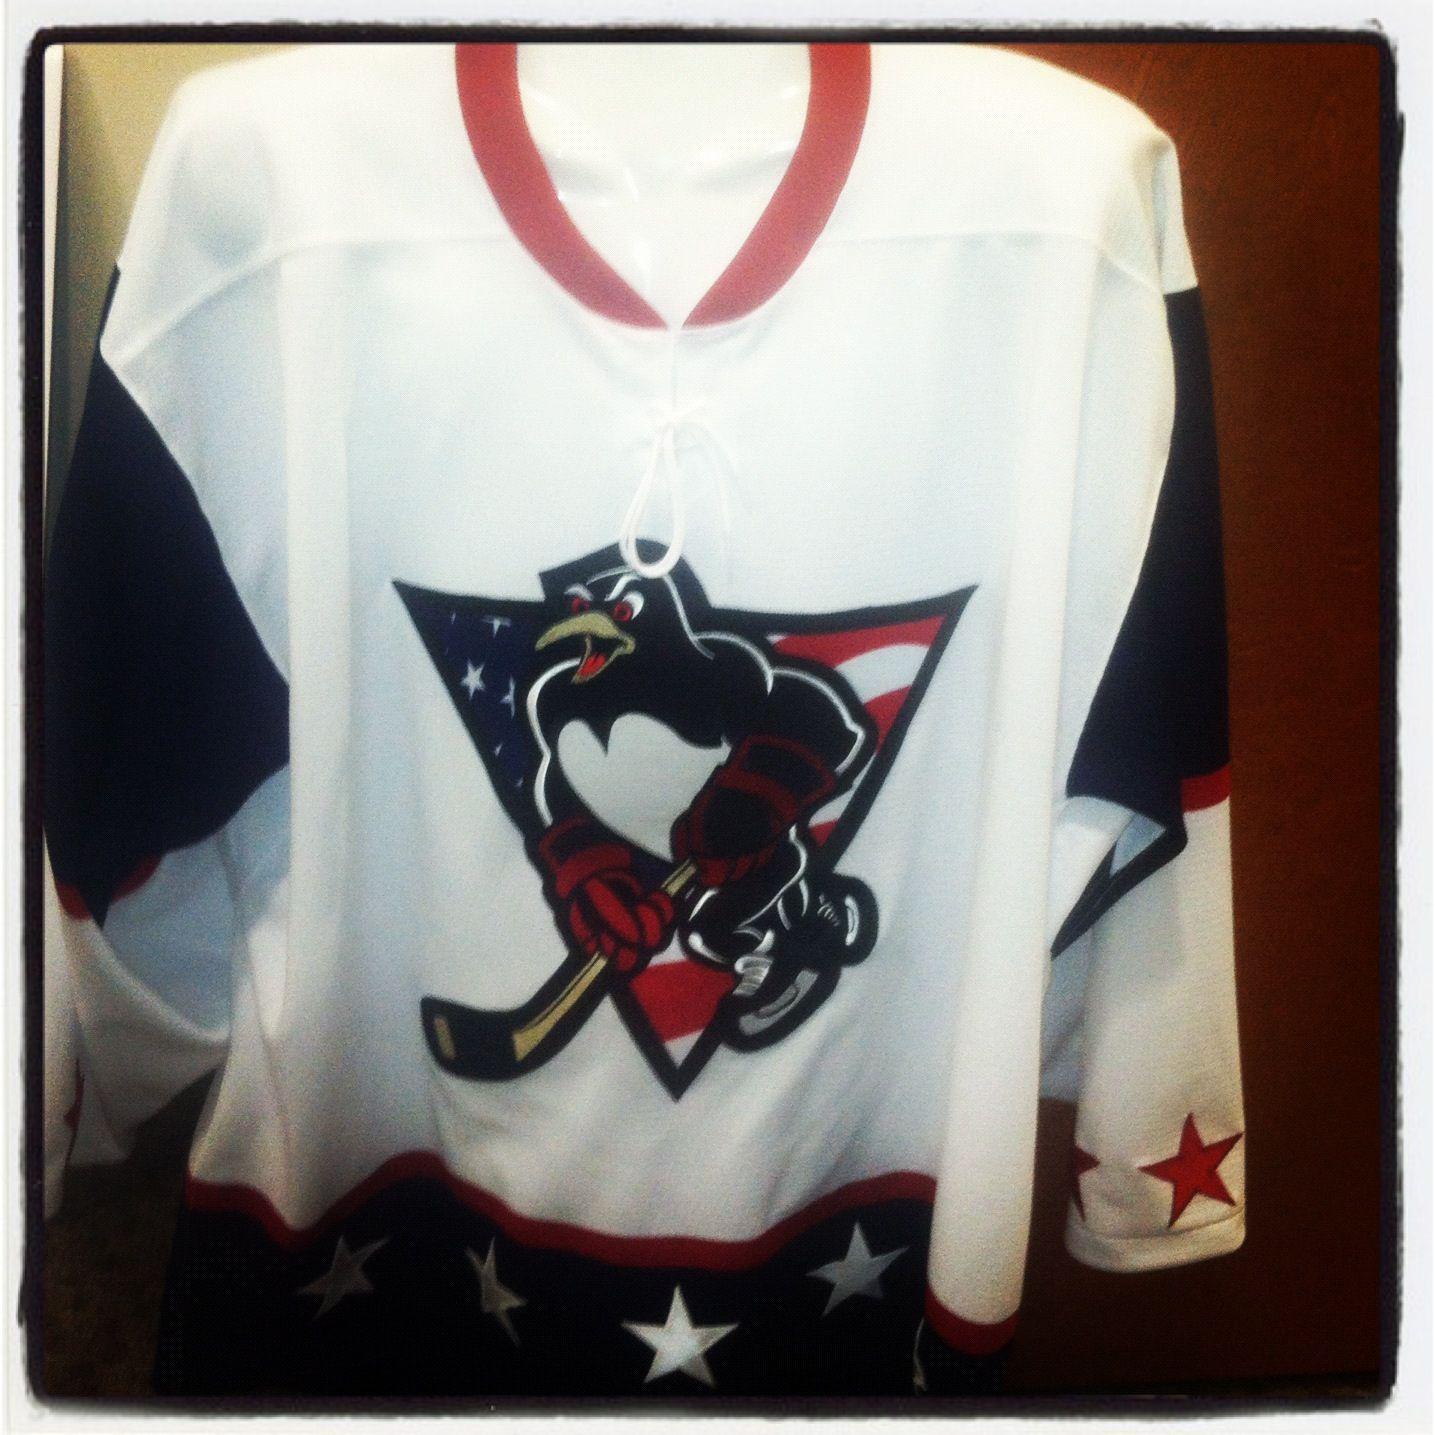 check out 6241e 82fb1 2012-13 military appreciation night sweater | Jerseys ...